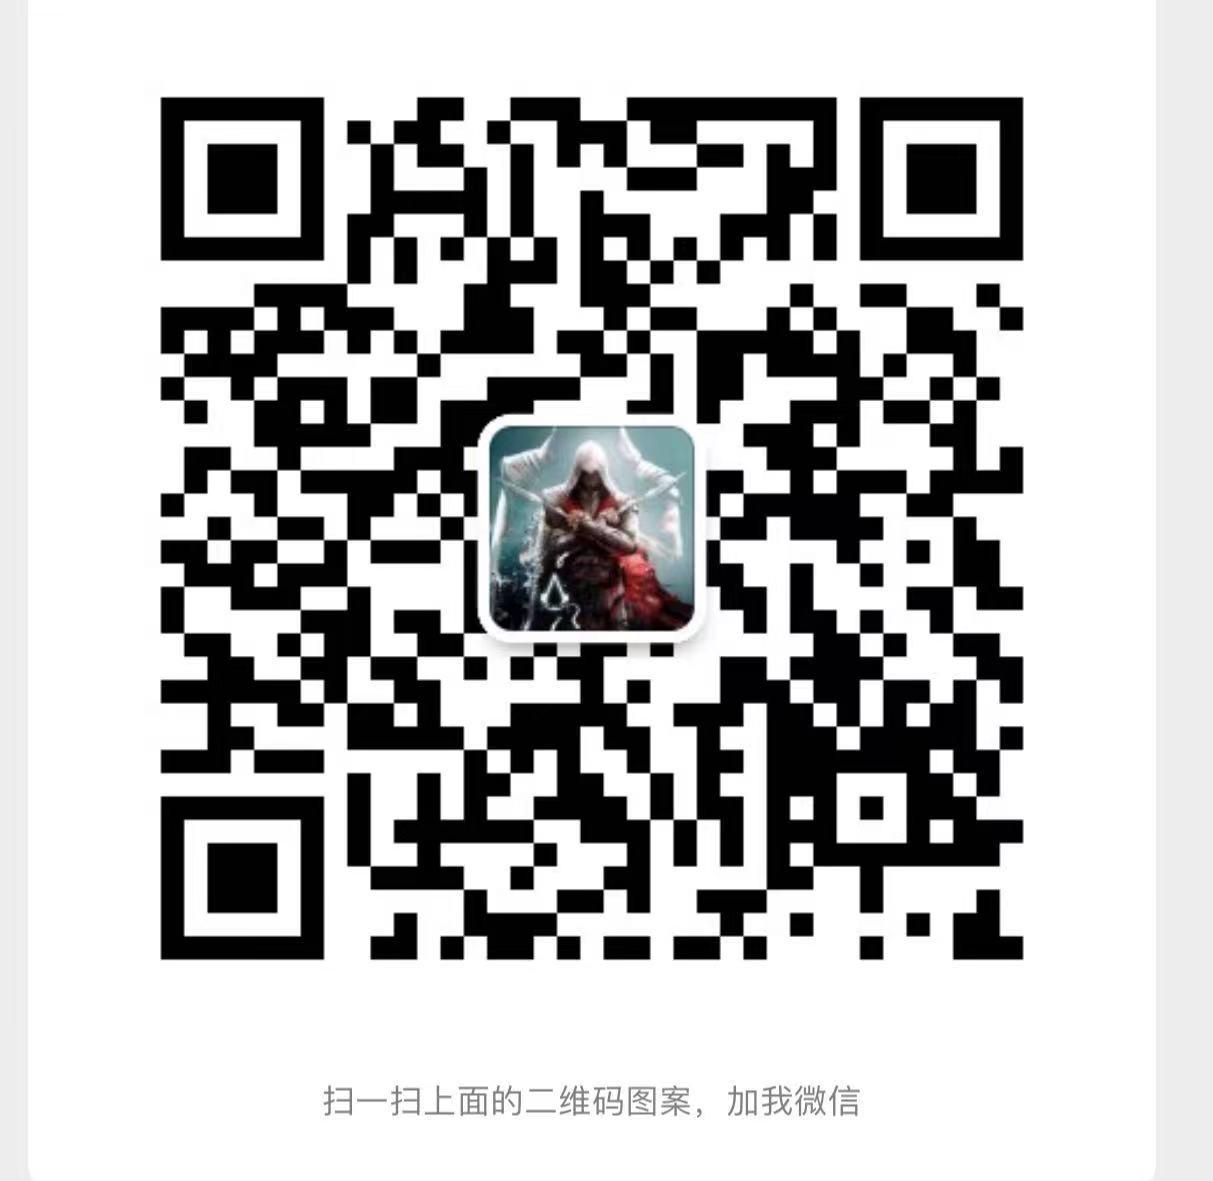 mmexport1623373610160